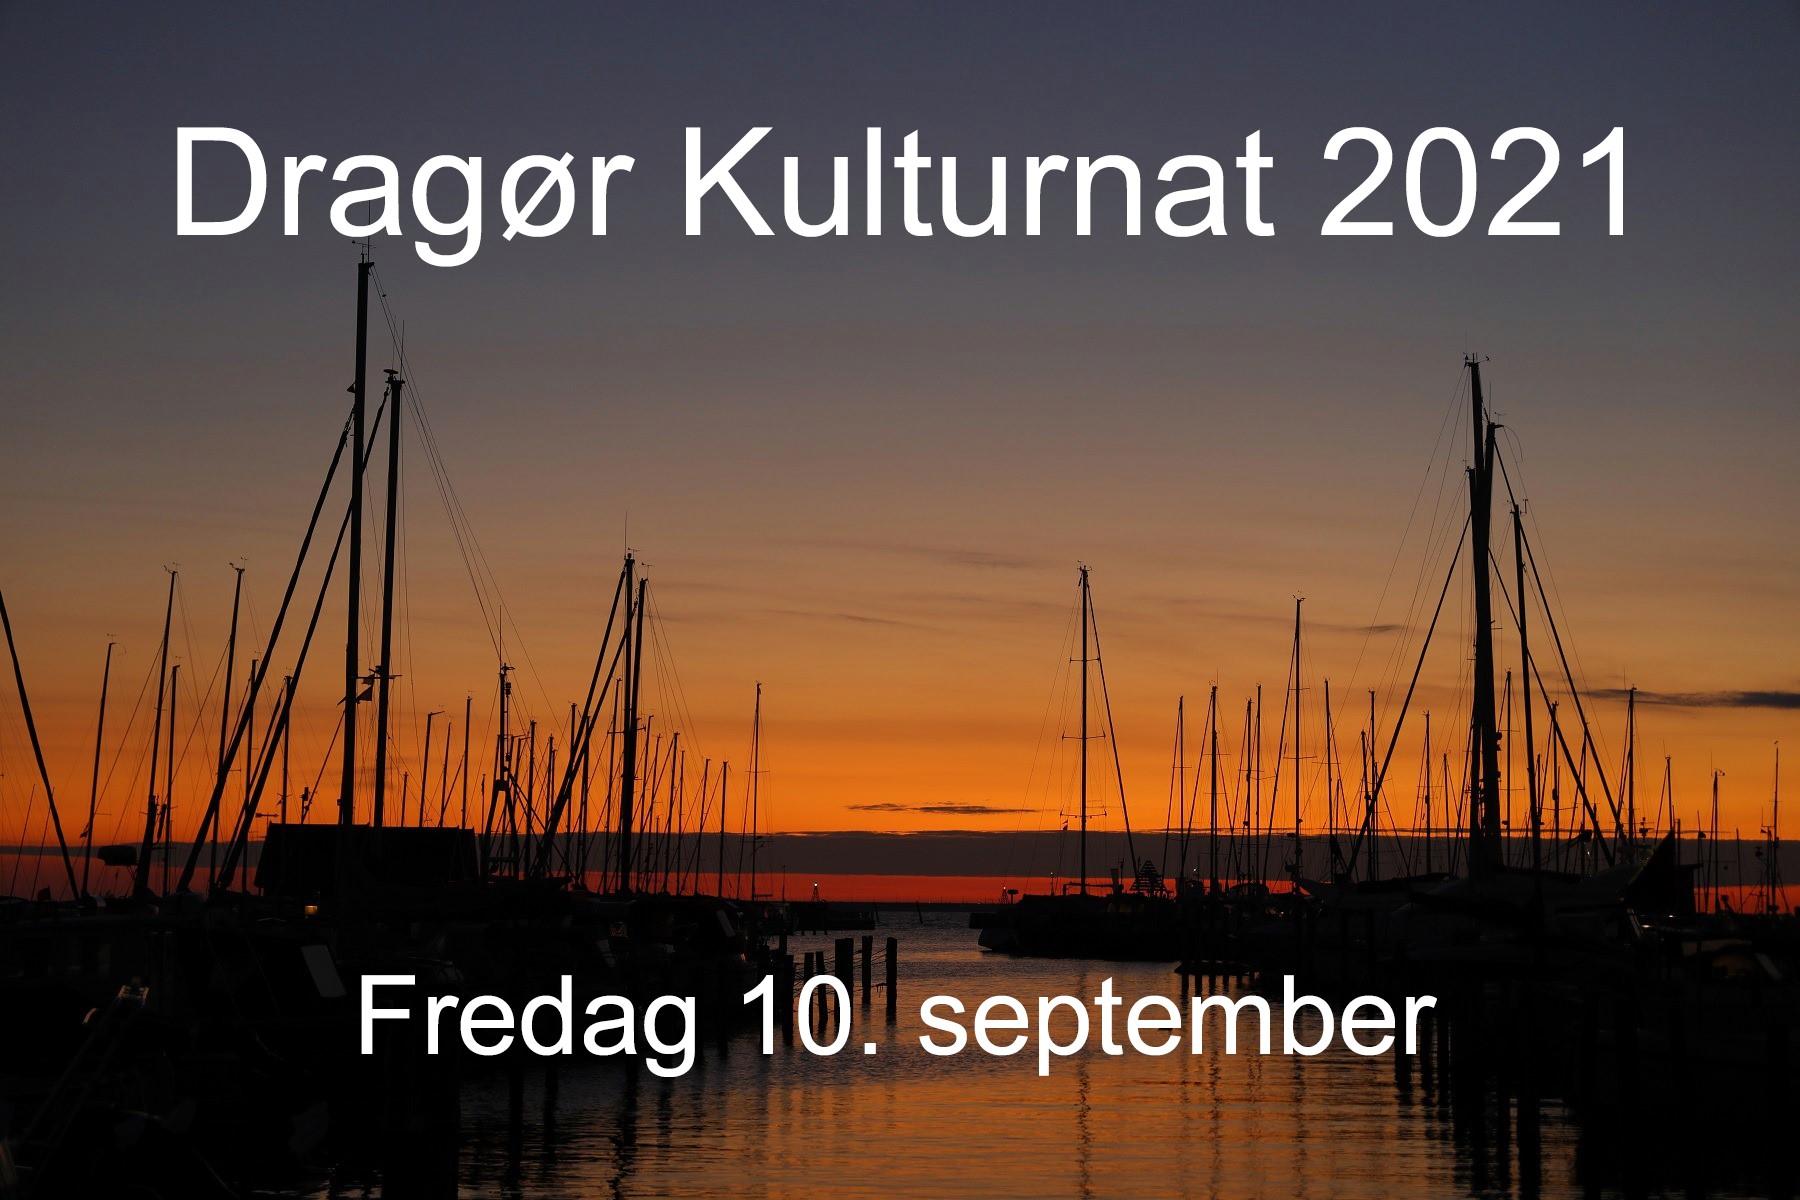 Dragør Kulturnacht 2021